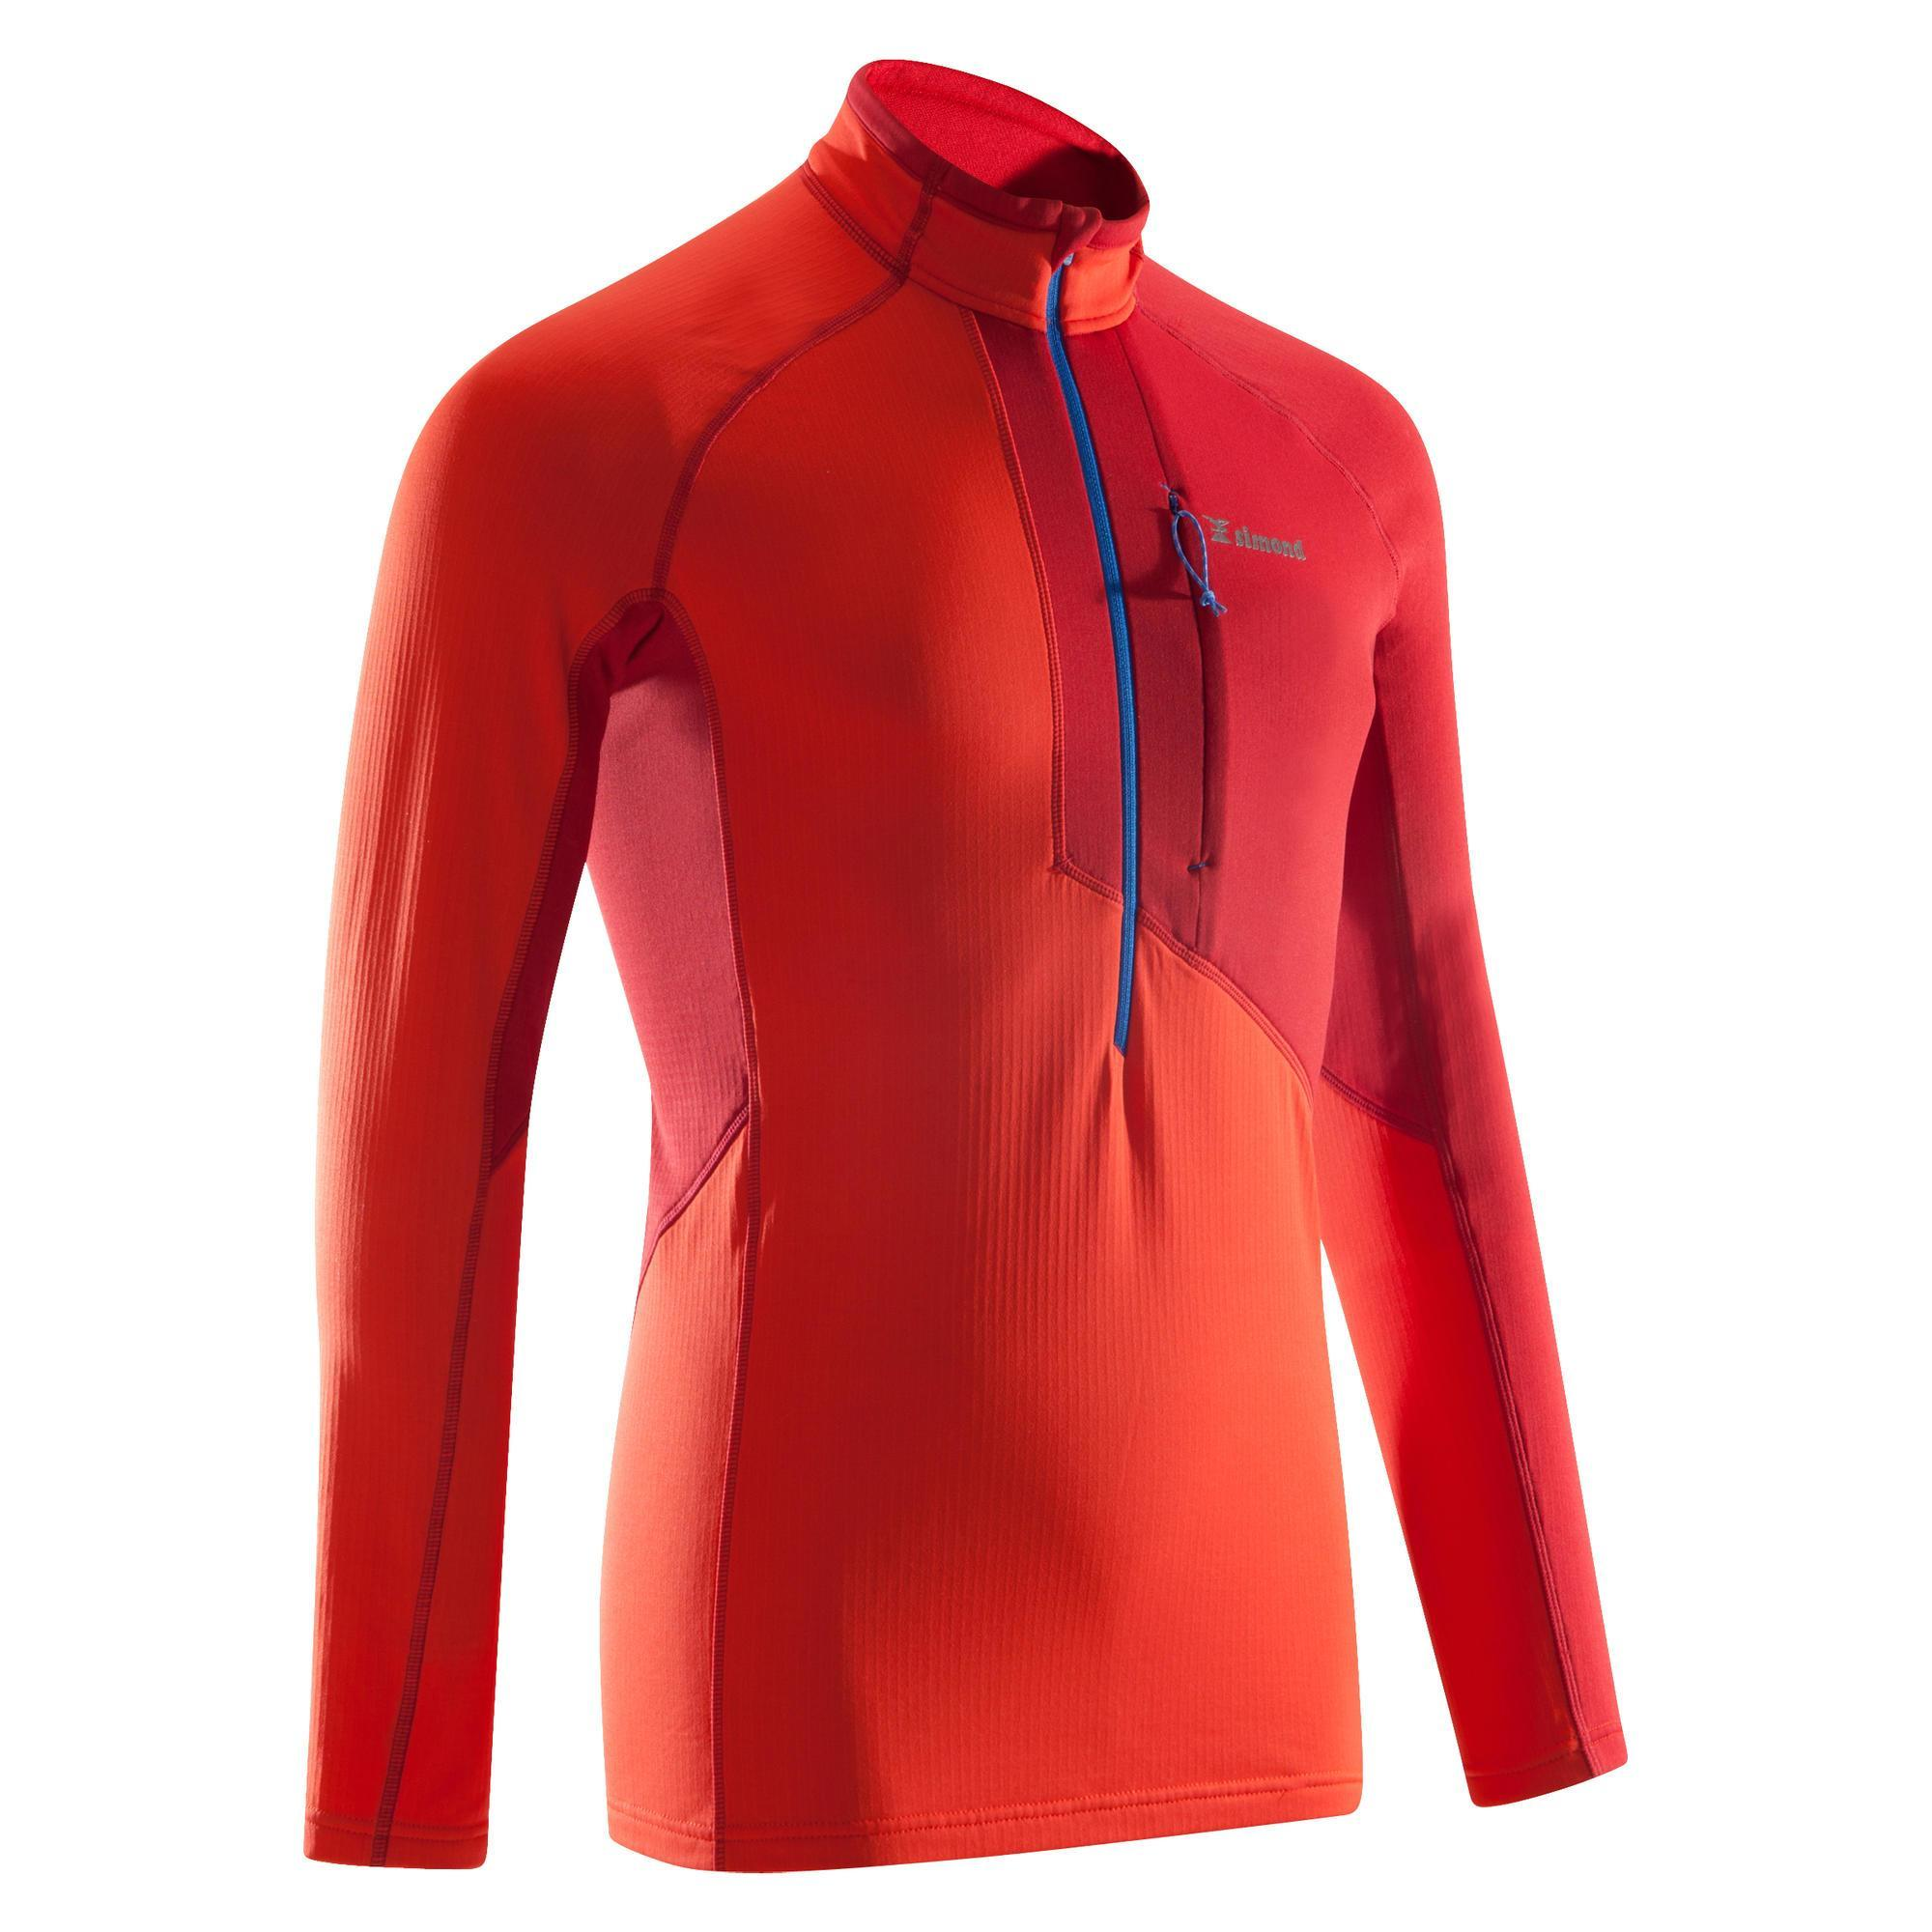 Klettershirt Sweat Alpinism 1/2 Zip Herren rot/zinnoberrot | Sportbekleidung > Sportshirts > Klettershirts | Simond